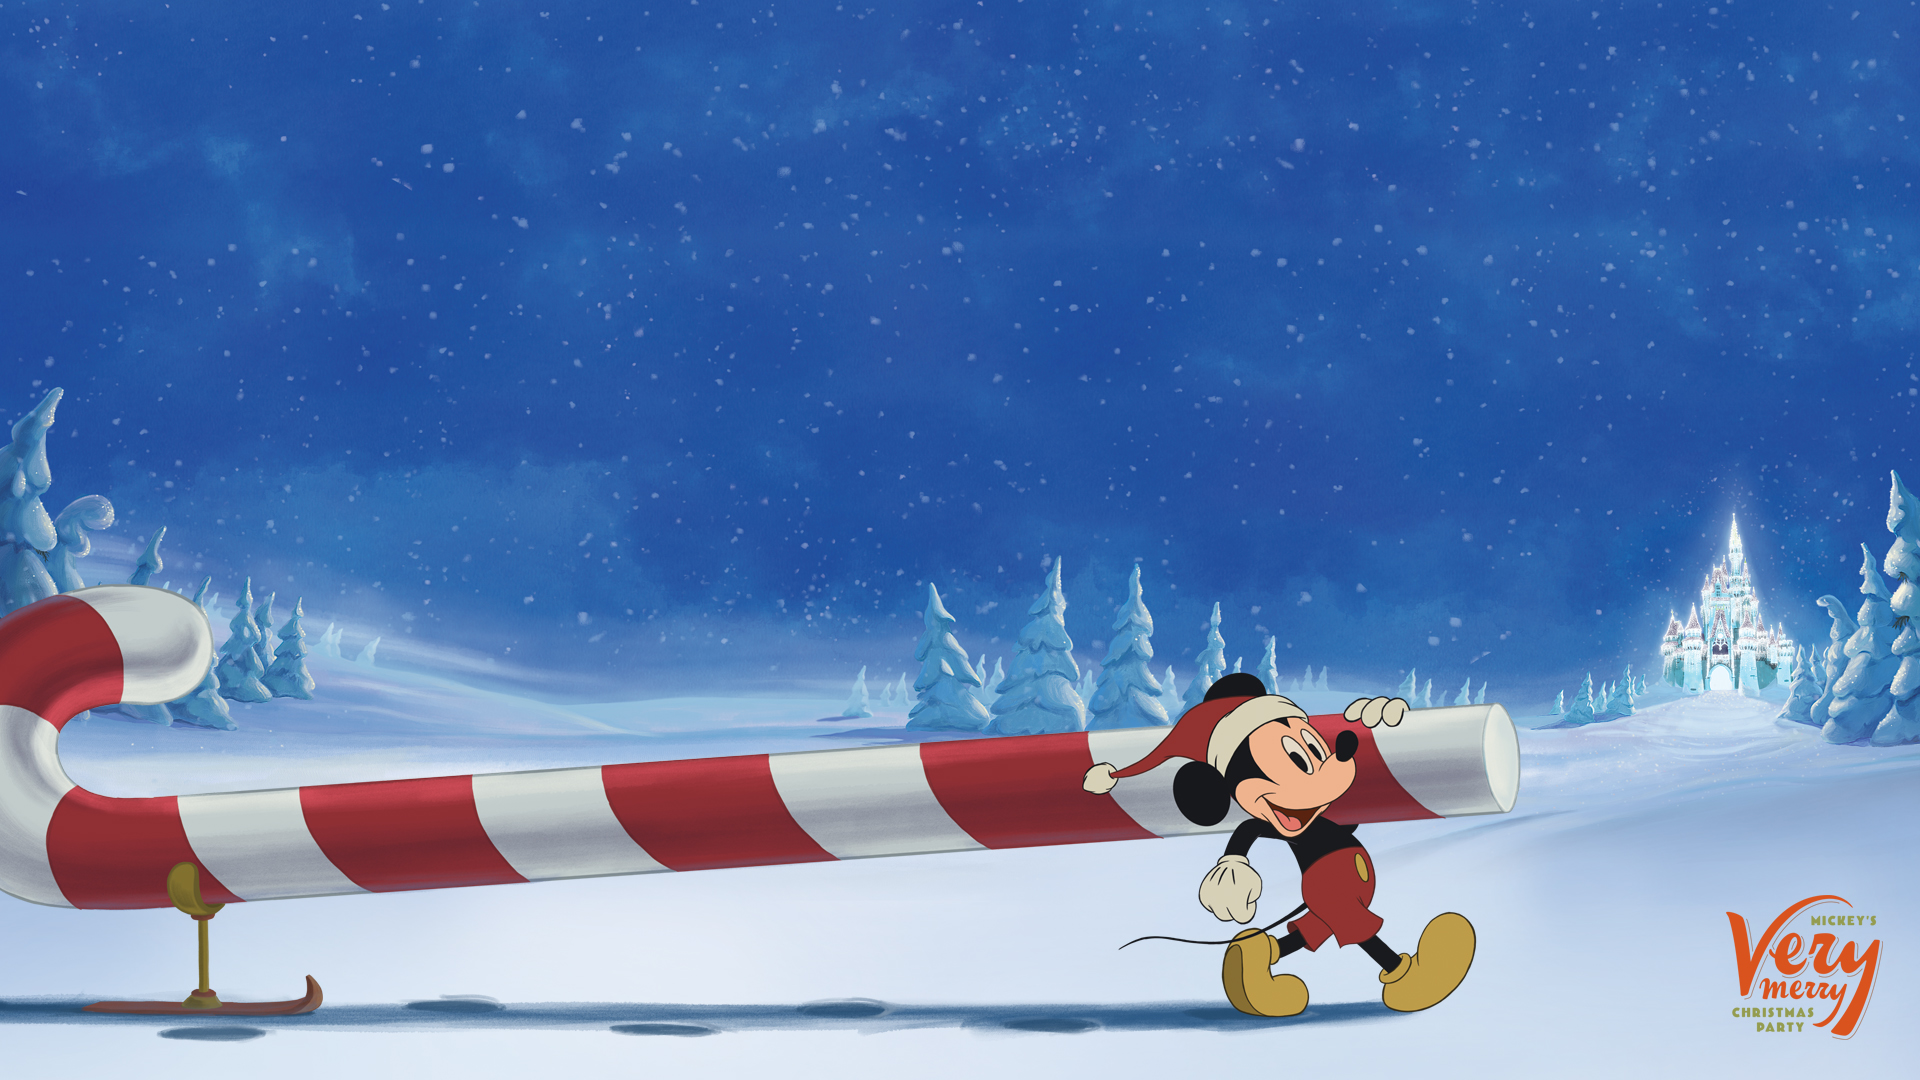 Animated Christmas Wallpaper For Ipad: Wallpapers « Disney Parks Blog